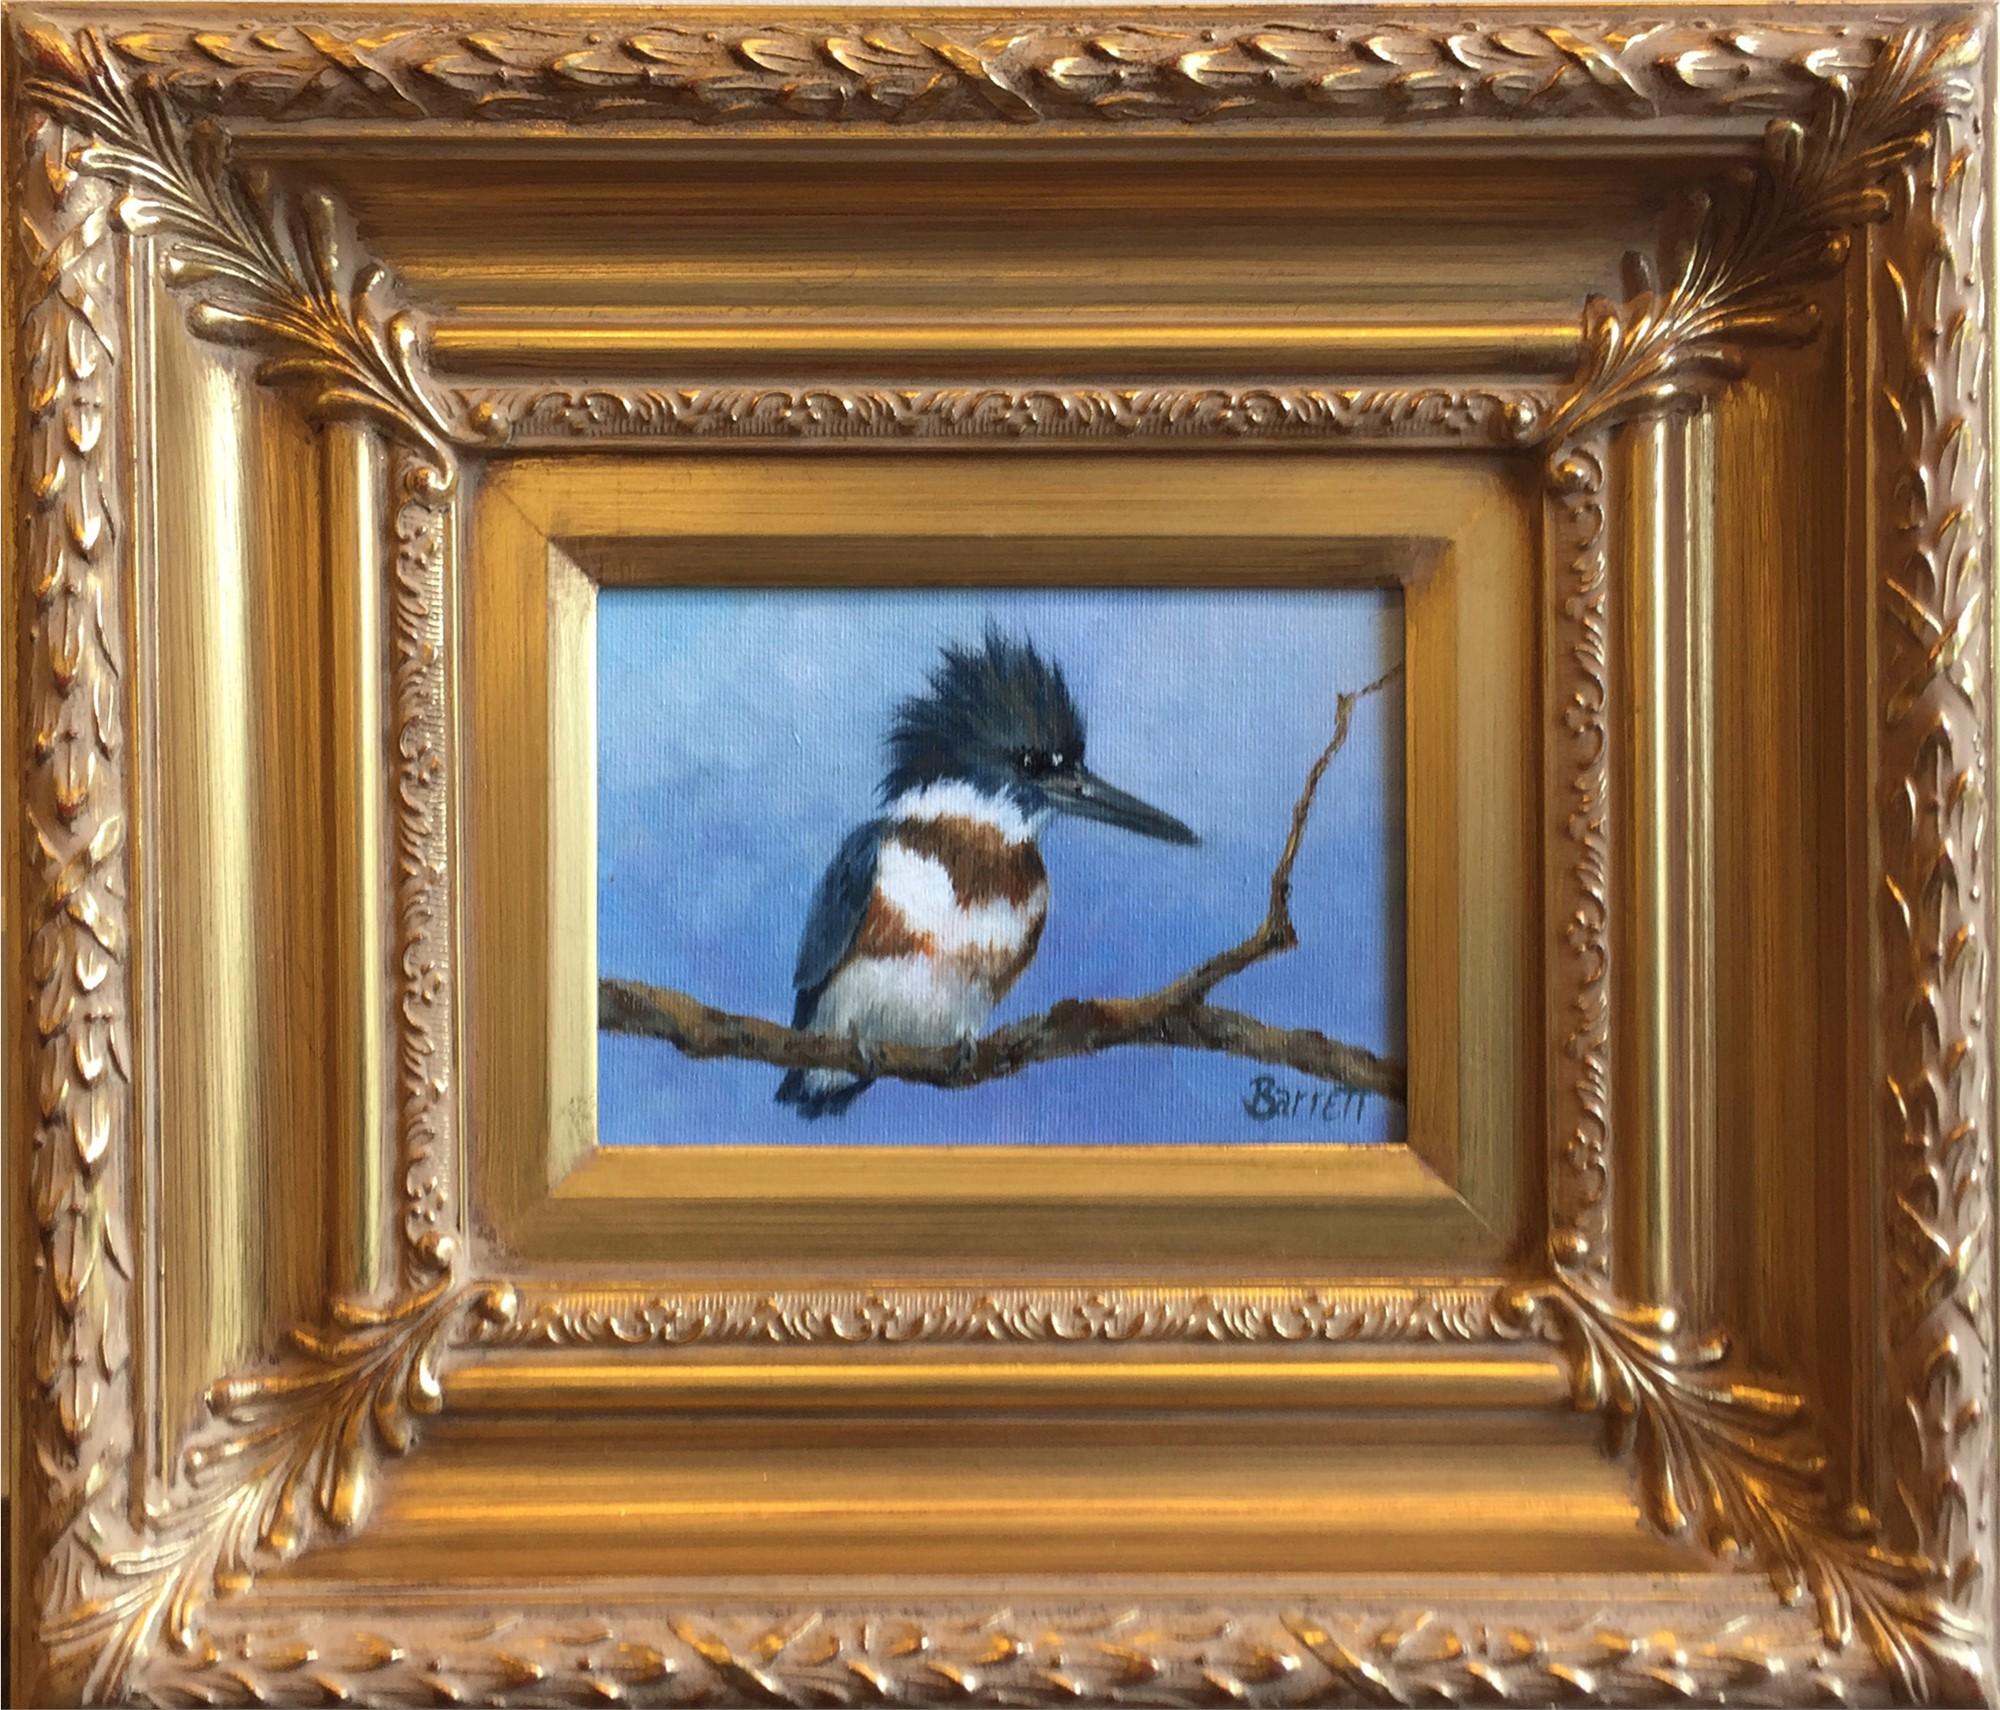 Kingfisher by Barrett Edwards